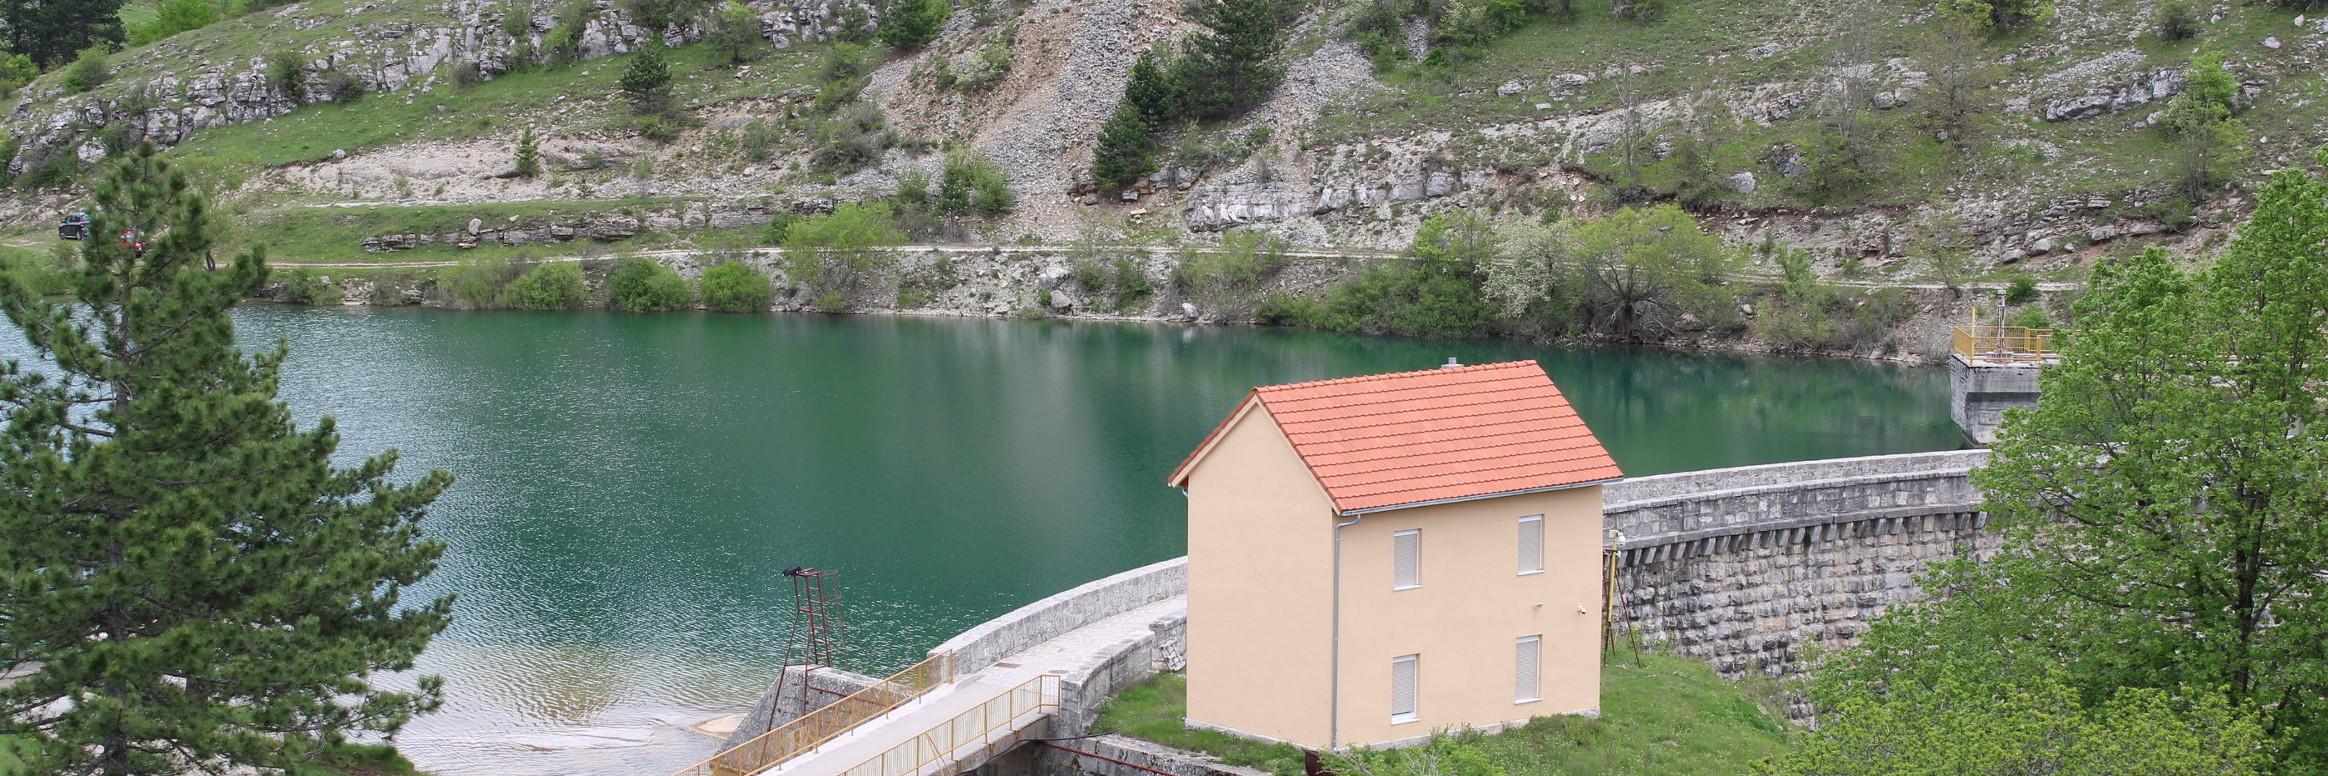 Озеро Клинье